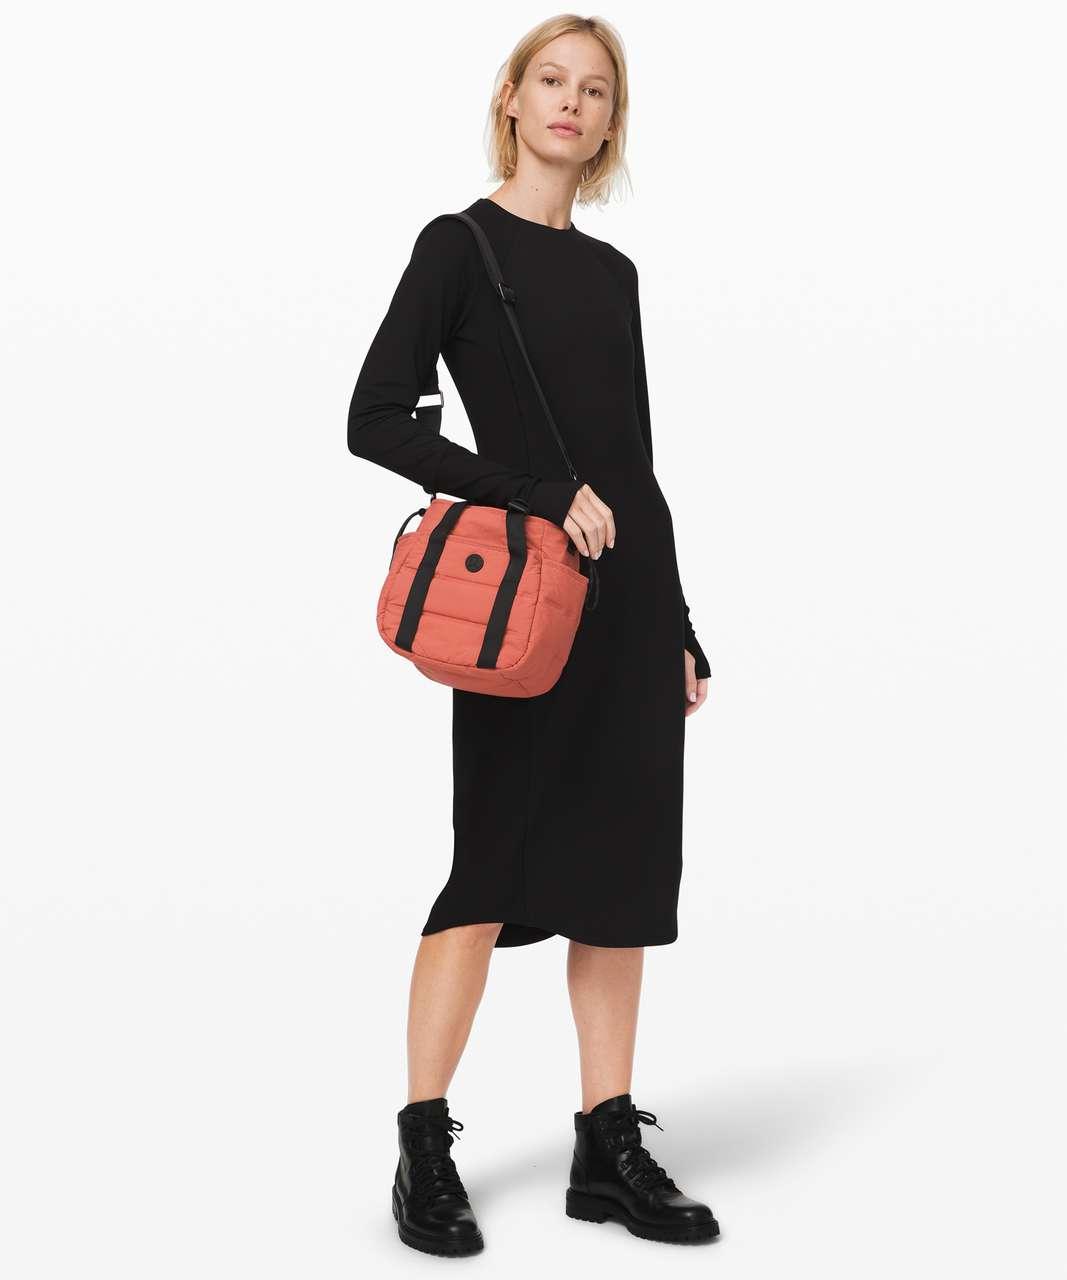 Lululemon Dash All Day Bucket Bag *6.5L - Copper Clay